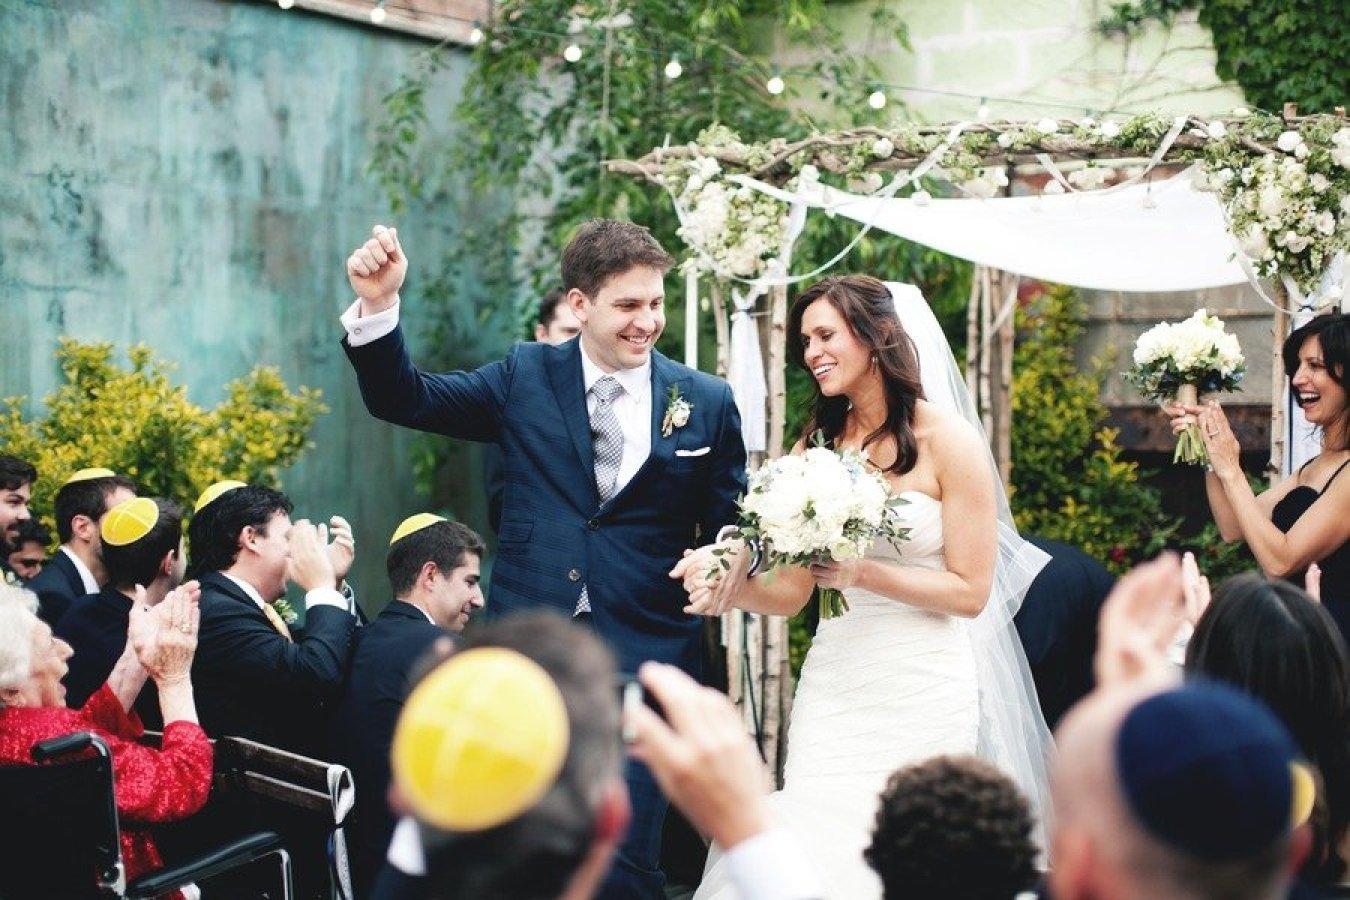 Brooklyn Wedding by Katie Osgood Photography + Rebecca Shepherd Floral Design